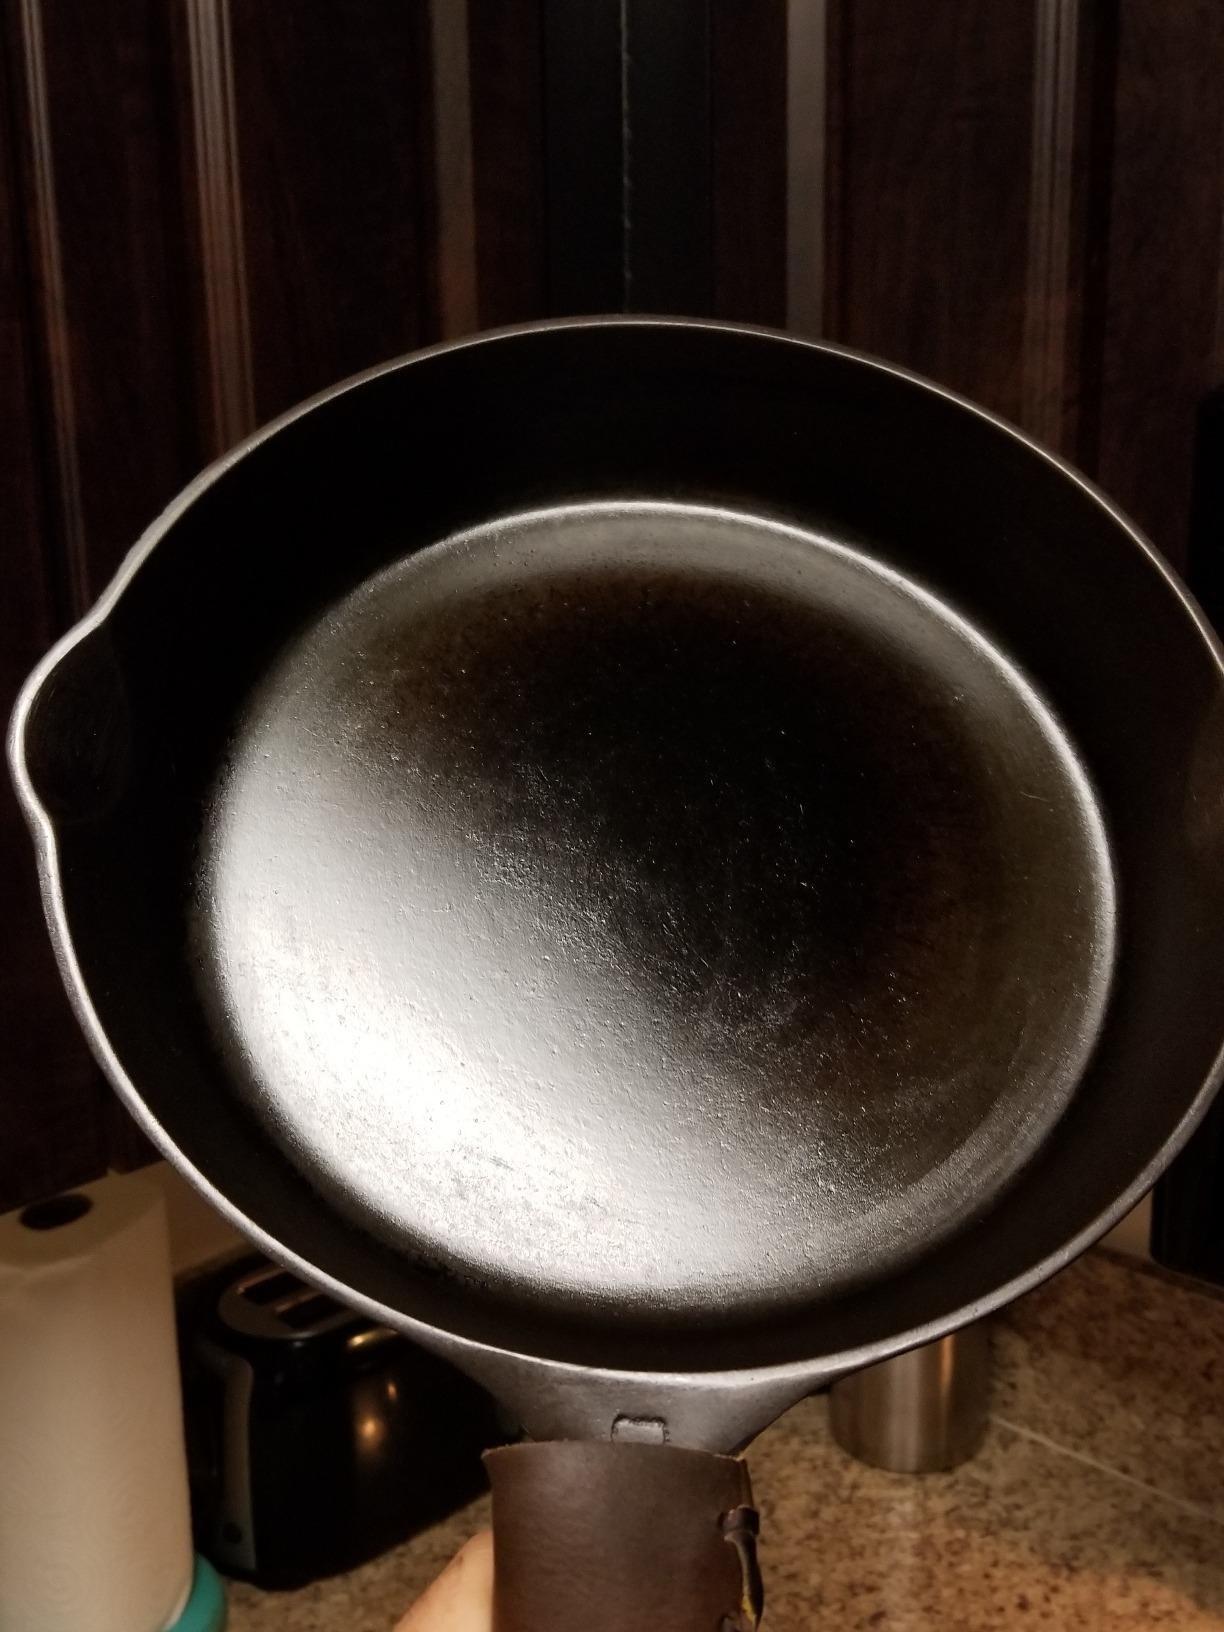 a very shiny cast iron skillet